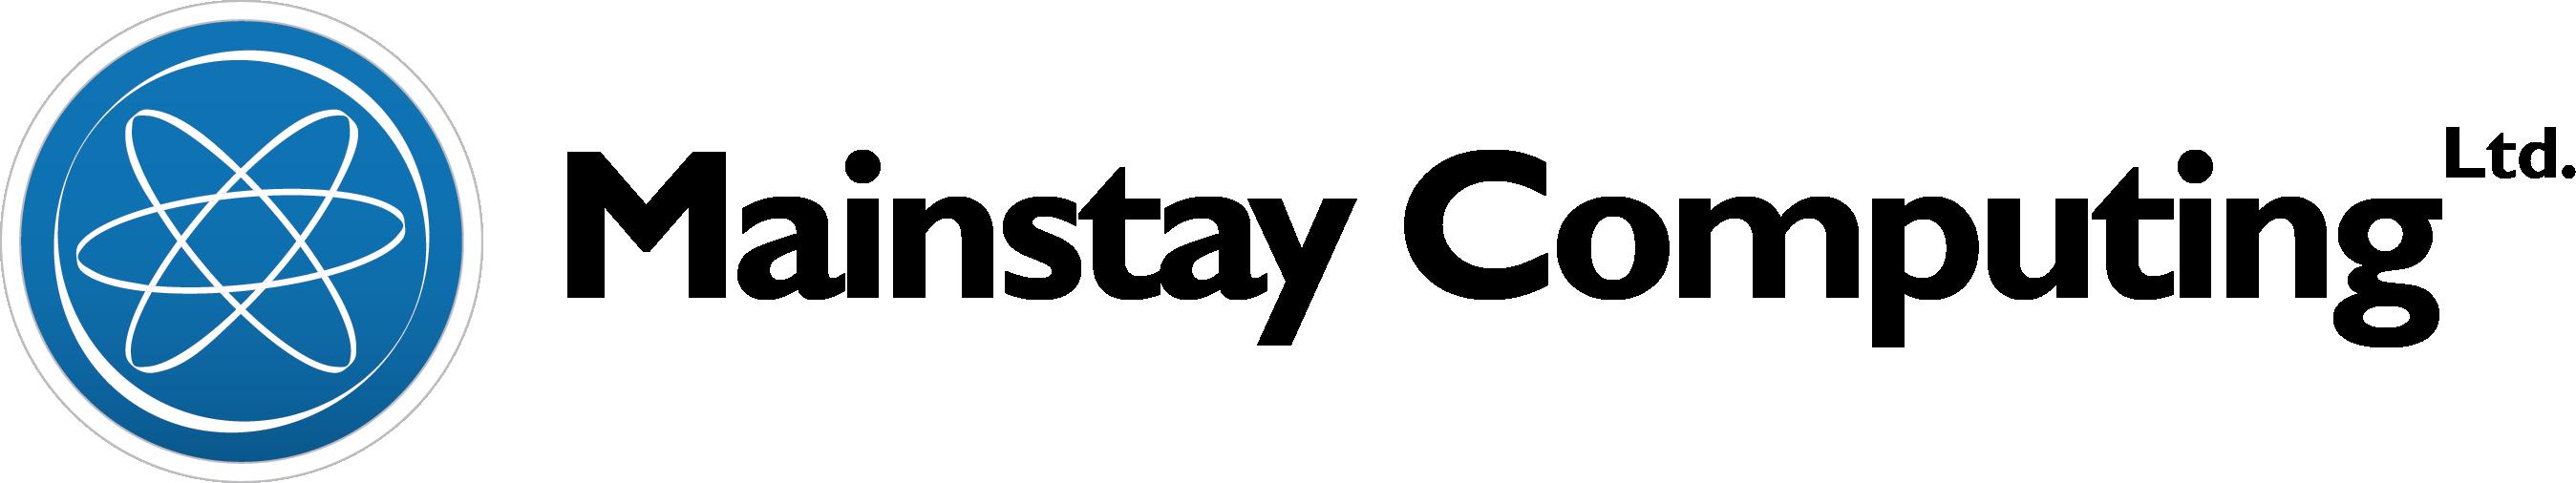 mainstay-computing-ltd-logo